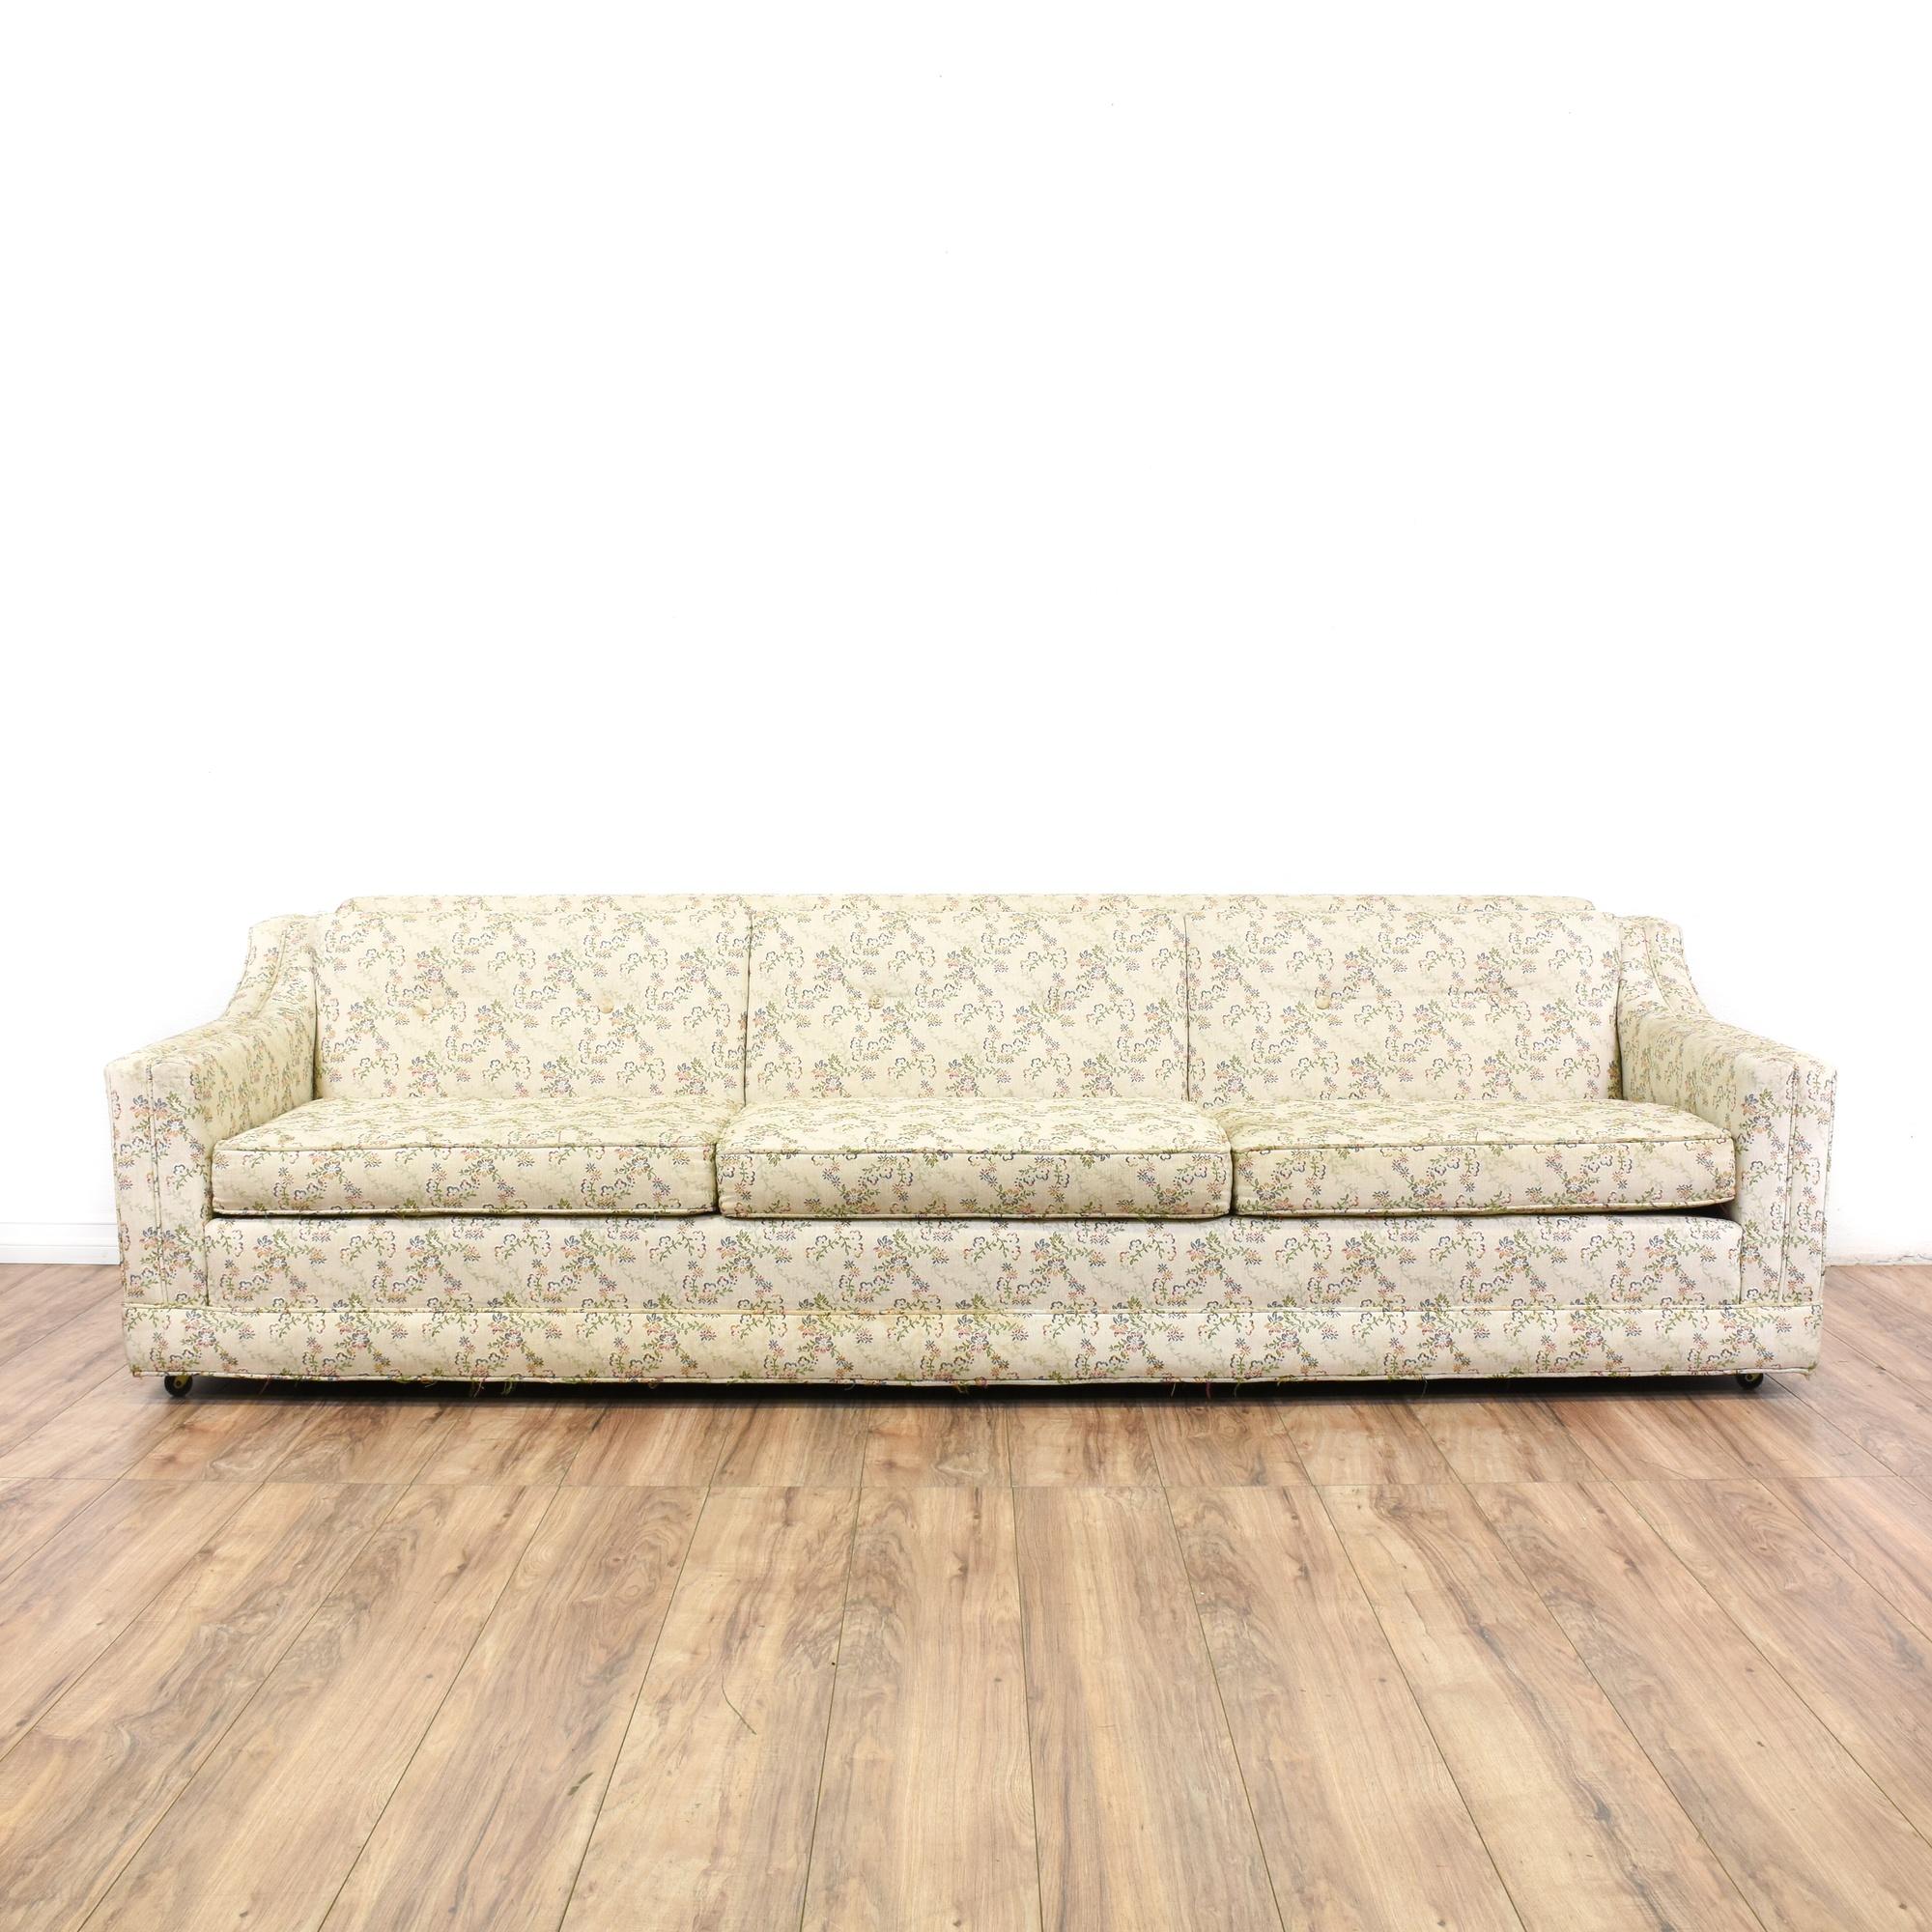 Mid Century Modern White Floral Sofa | Loveseat Vintage ...